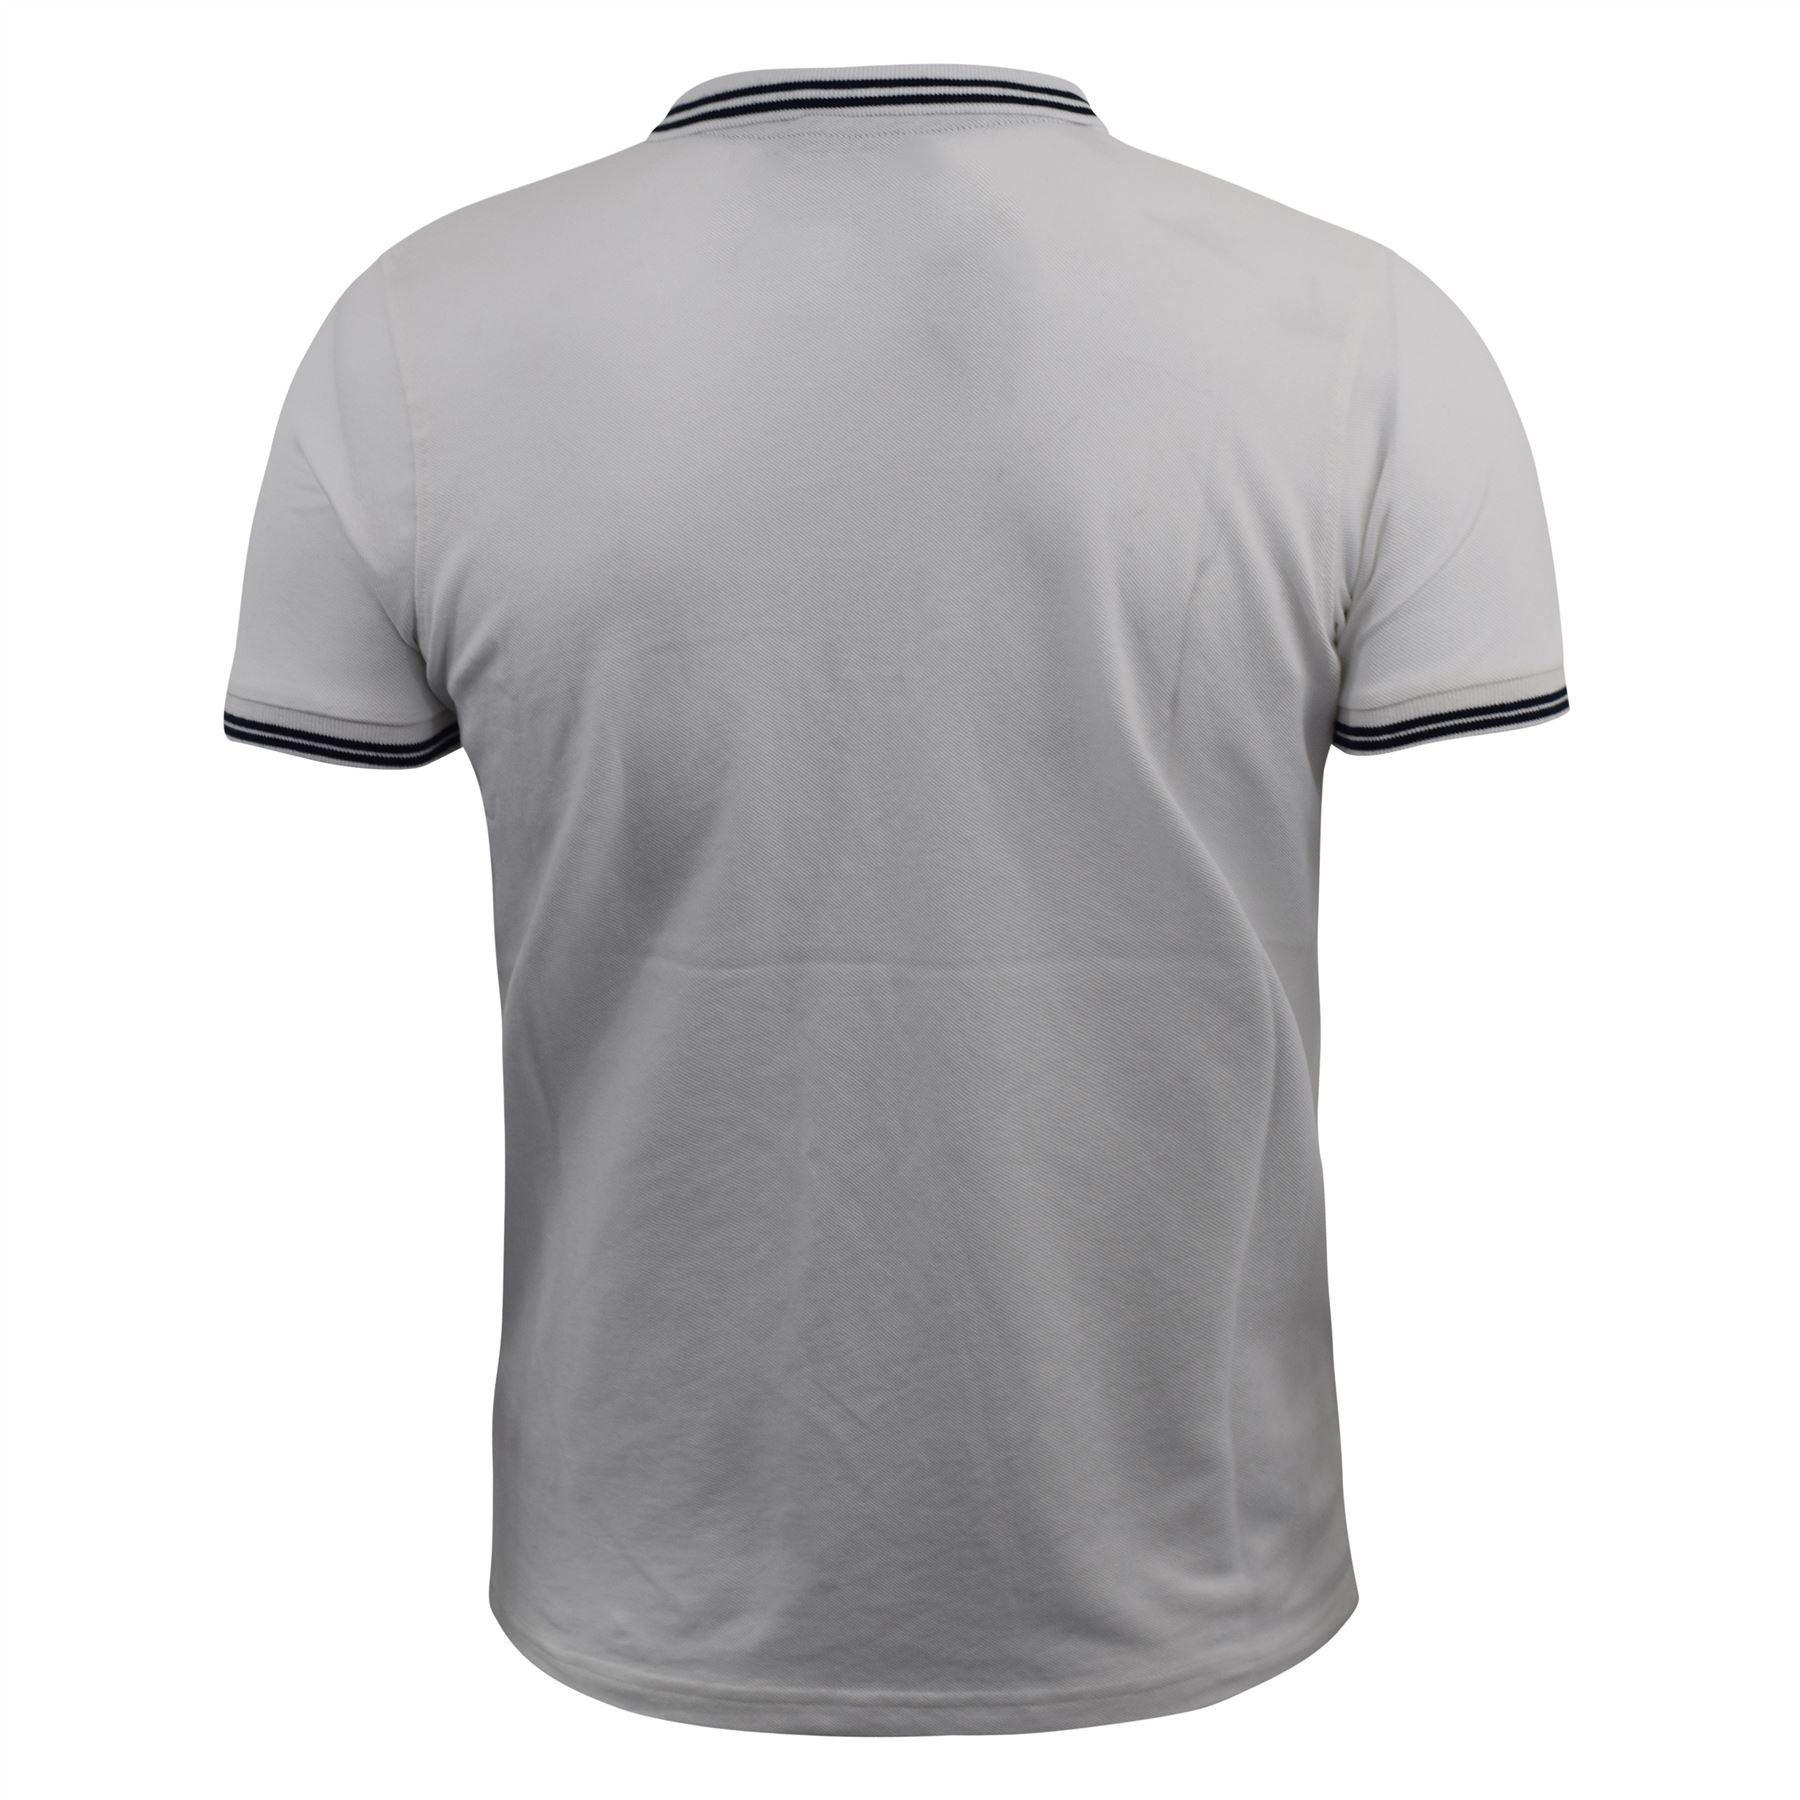 Mens-Polo-Shirt-kangol-Short-Sleeve-T-Shirt-Top-Rumi thumbnail 7